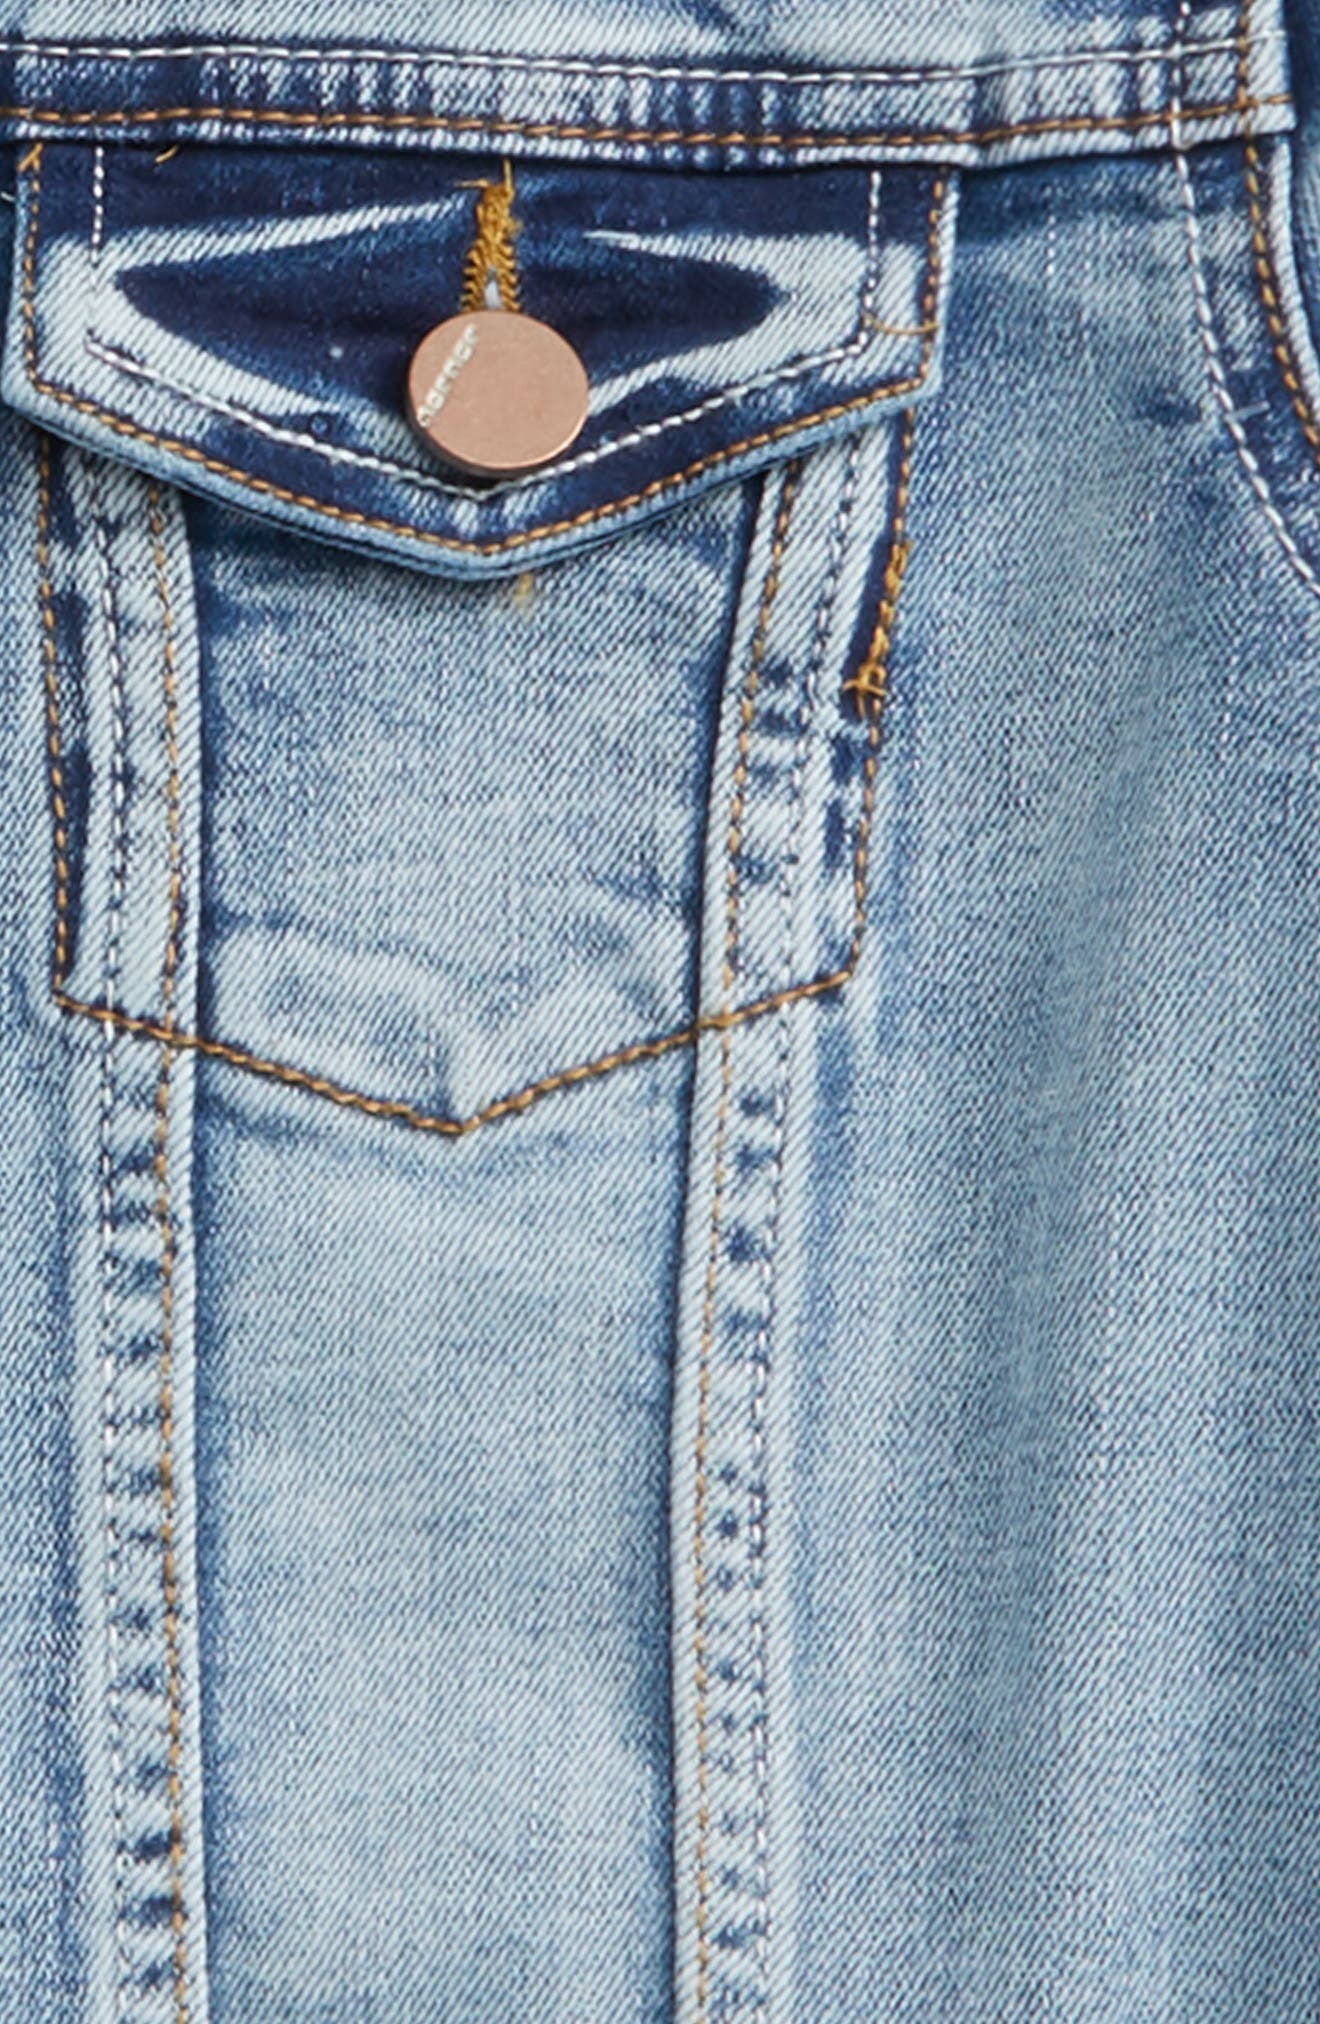 Denise Stretch Denim Jacket,                             Alternate thumbnail 2, color,                             Medium Wash